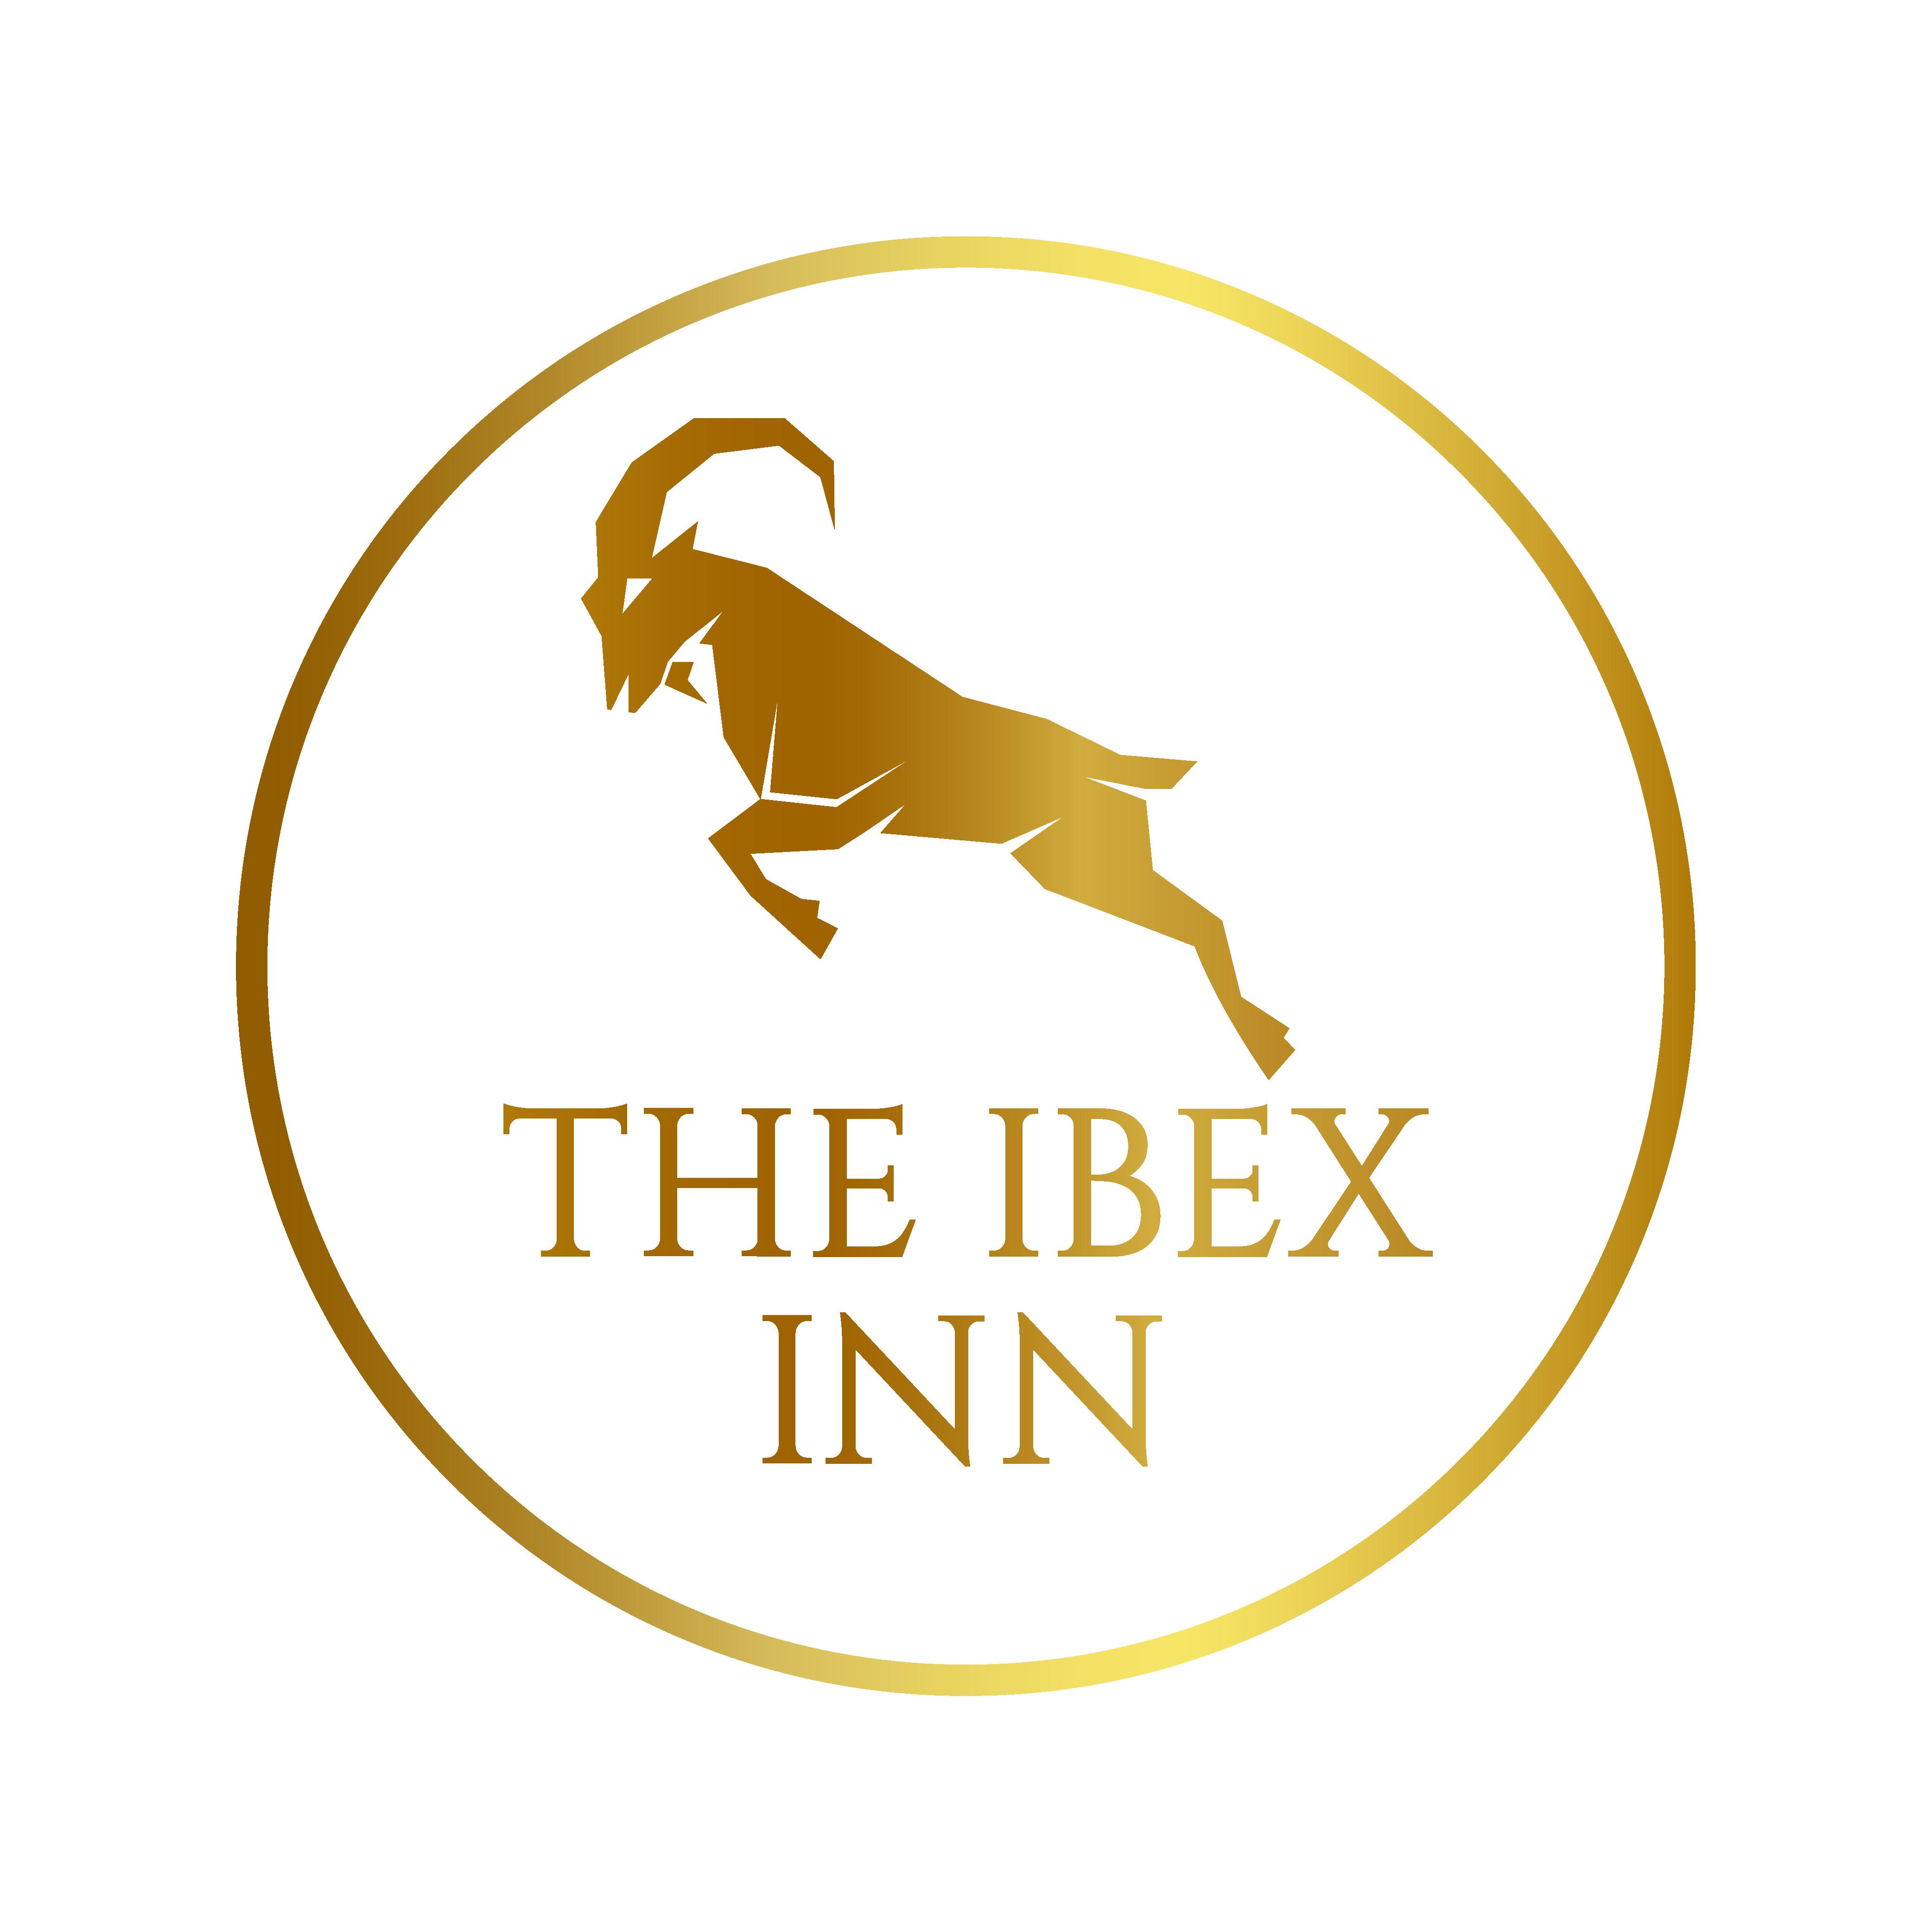 THE IBEX INN